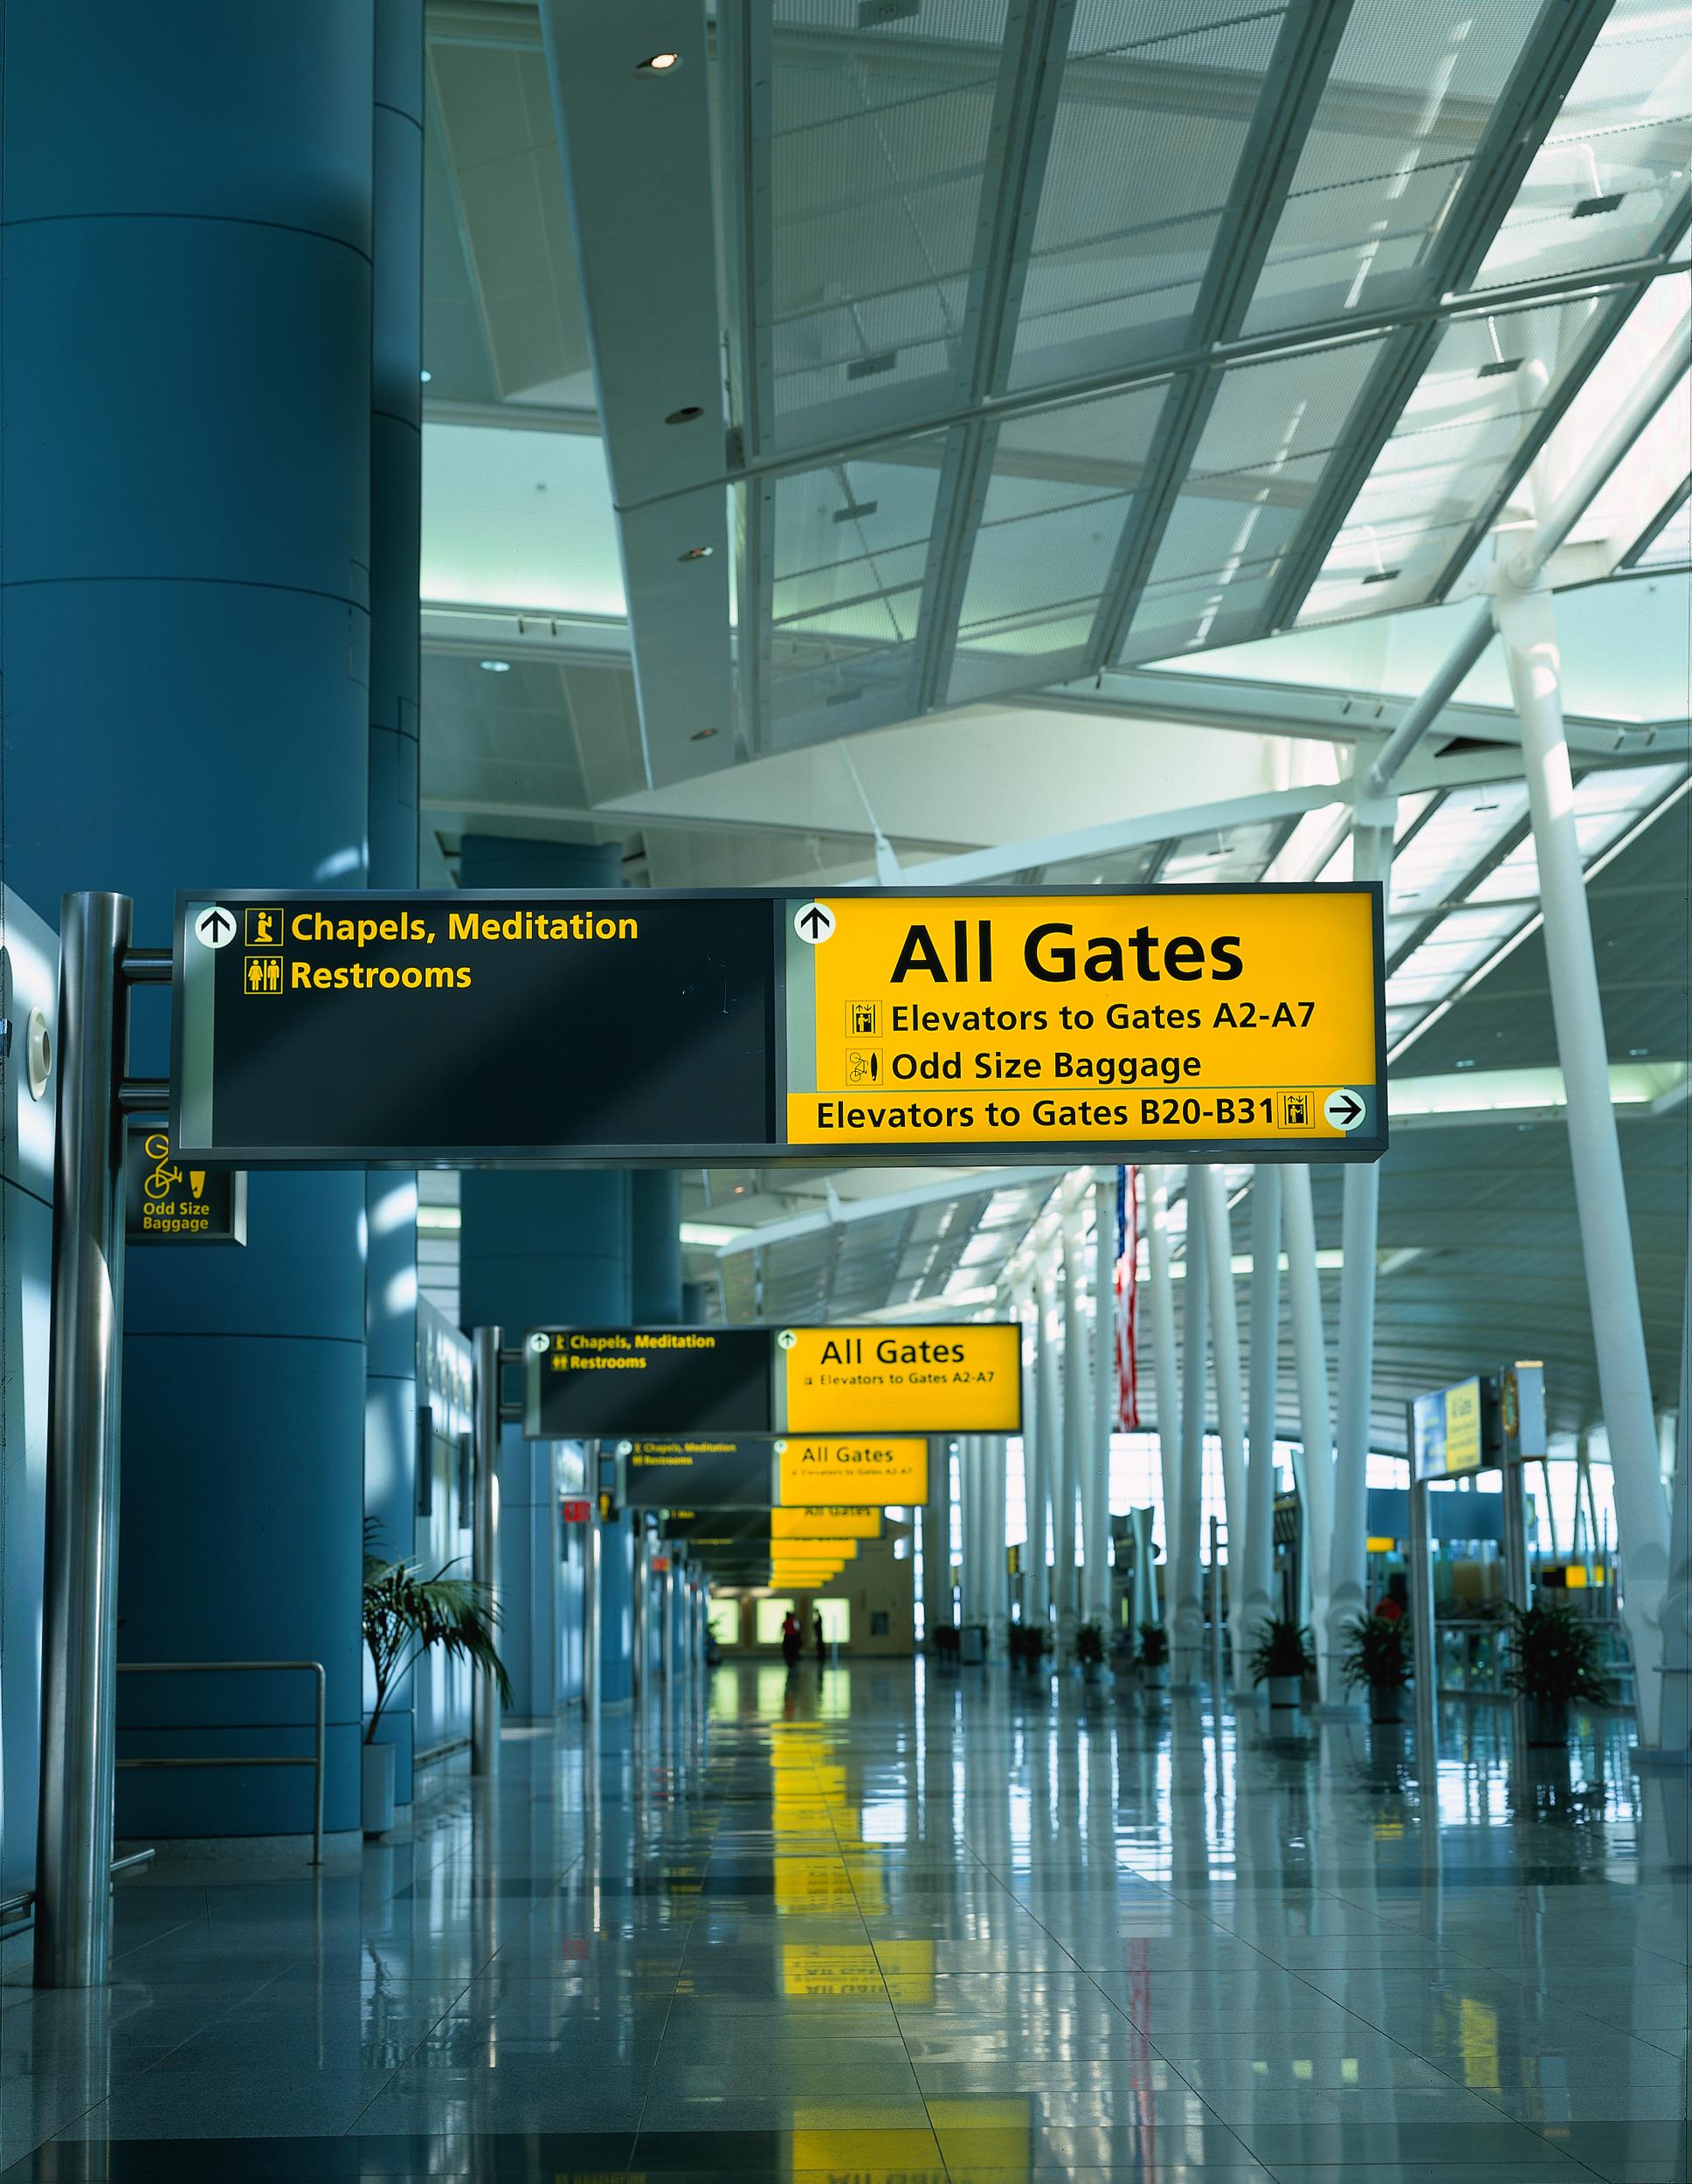 Project image 2 for JFK Terminal 4 Signage, Port Authority of NY & NJ